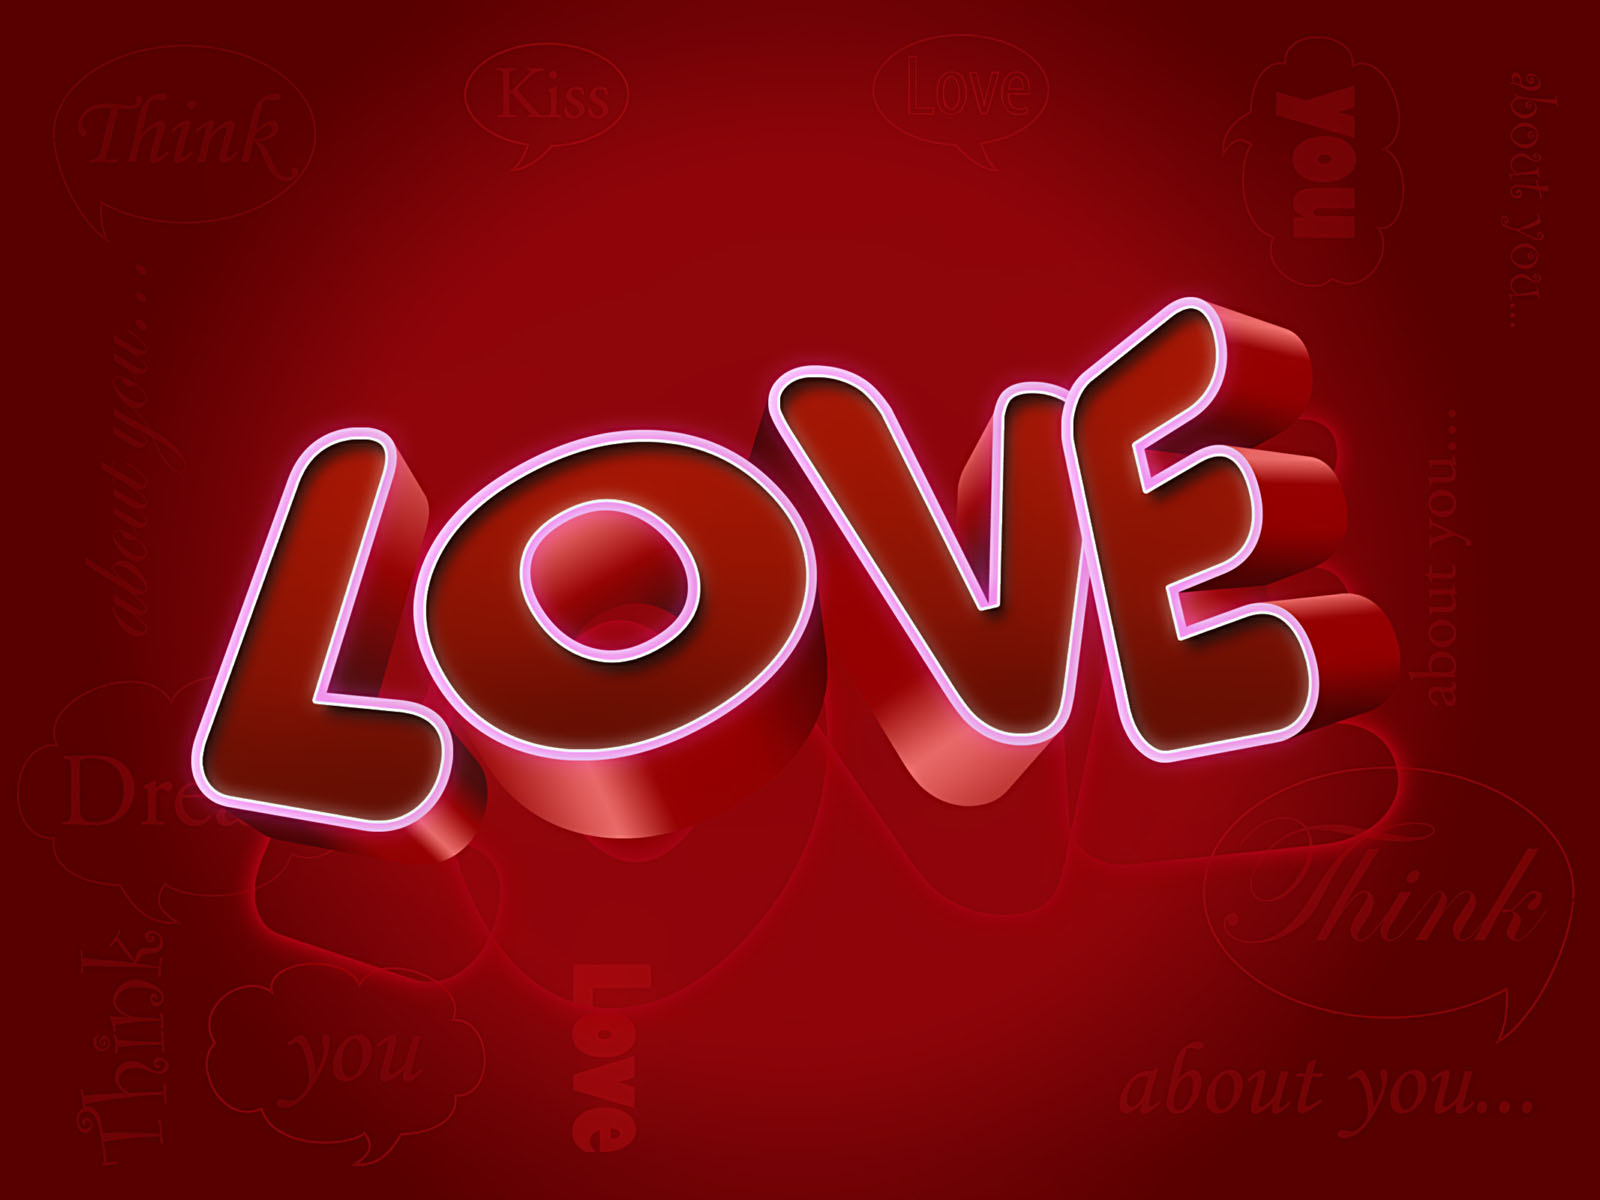 Love words wallpapers - Y k love wallpaper ...